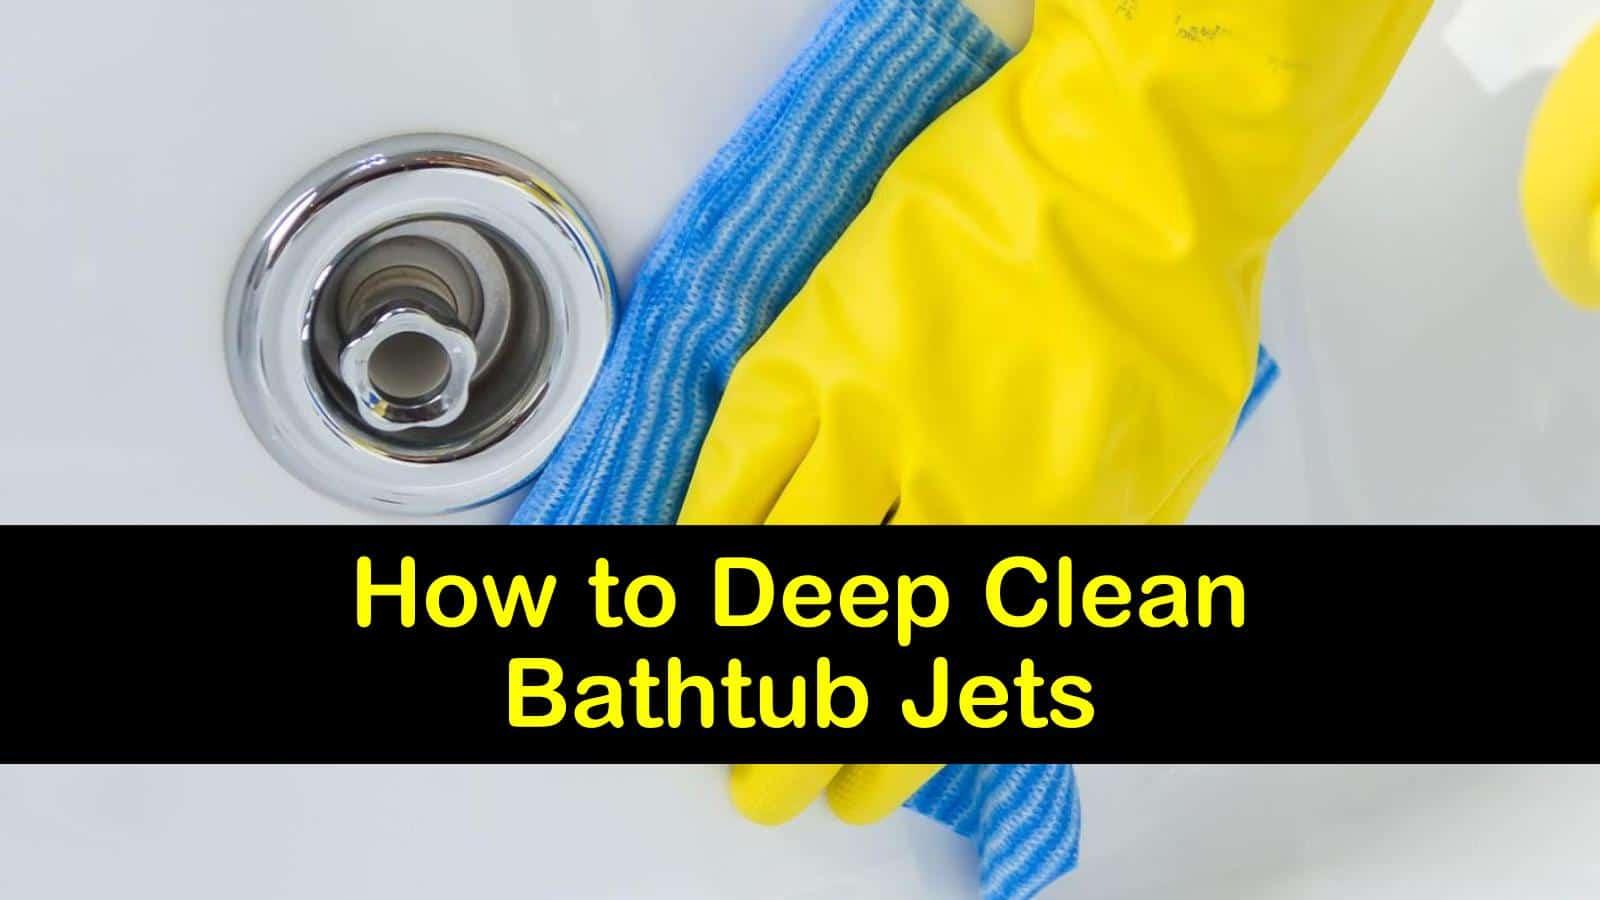 how to clean bathtub jets titleimg1